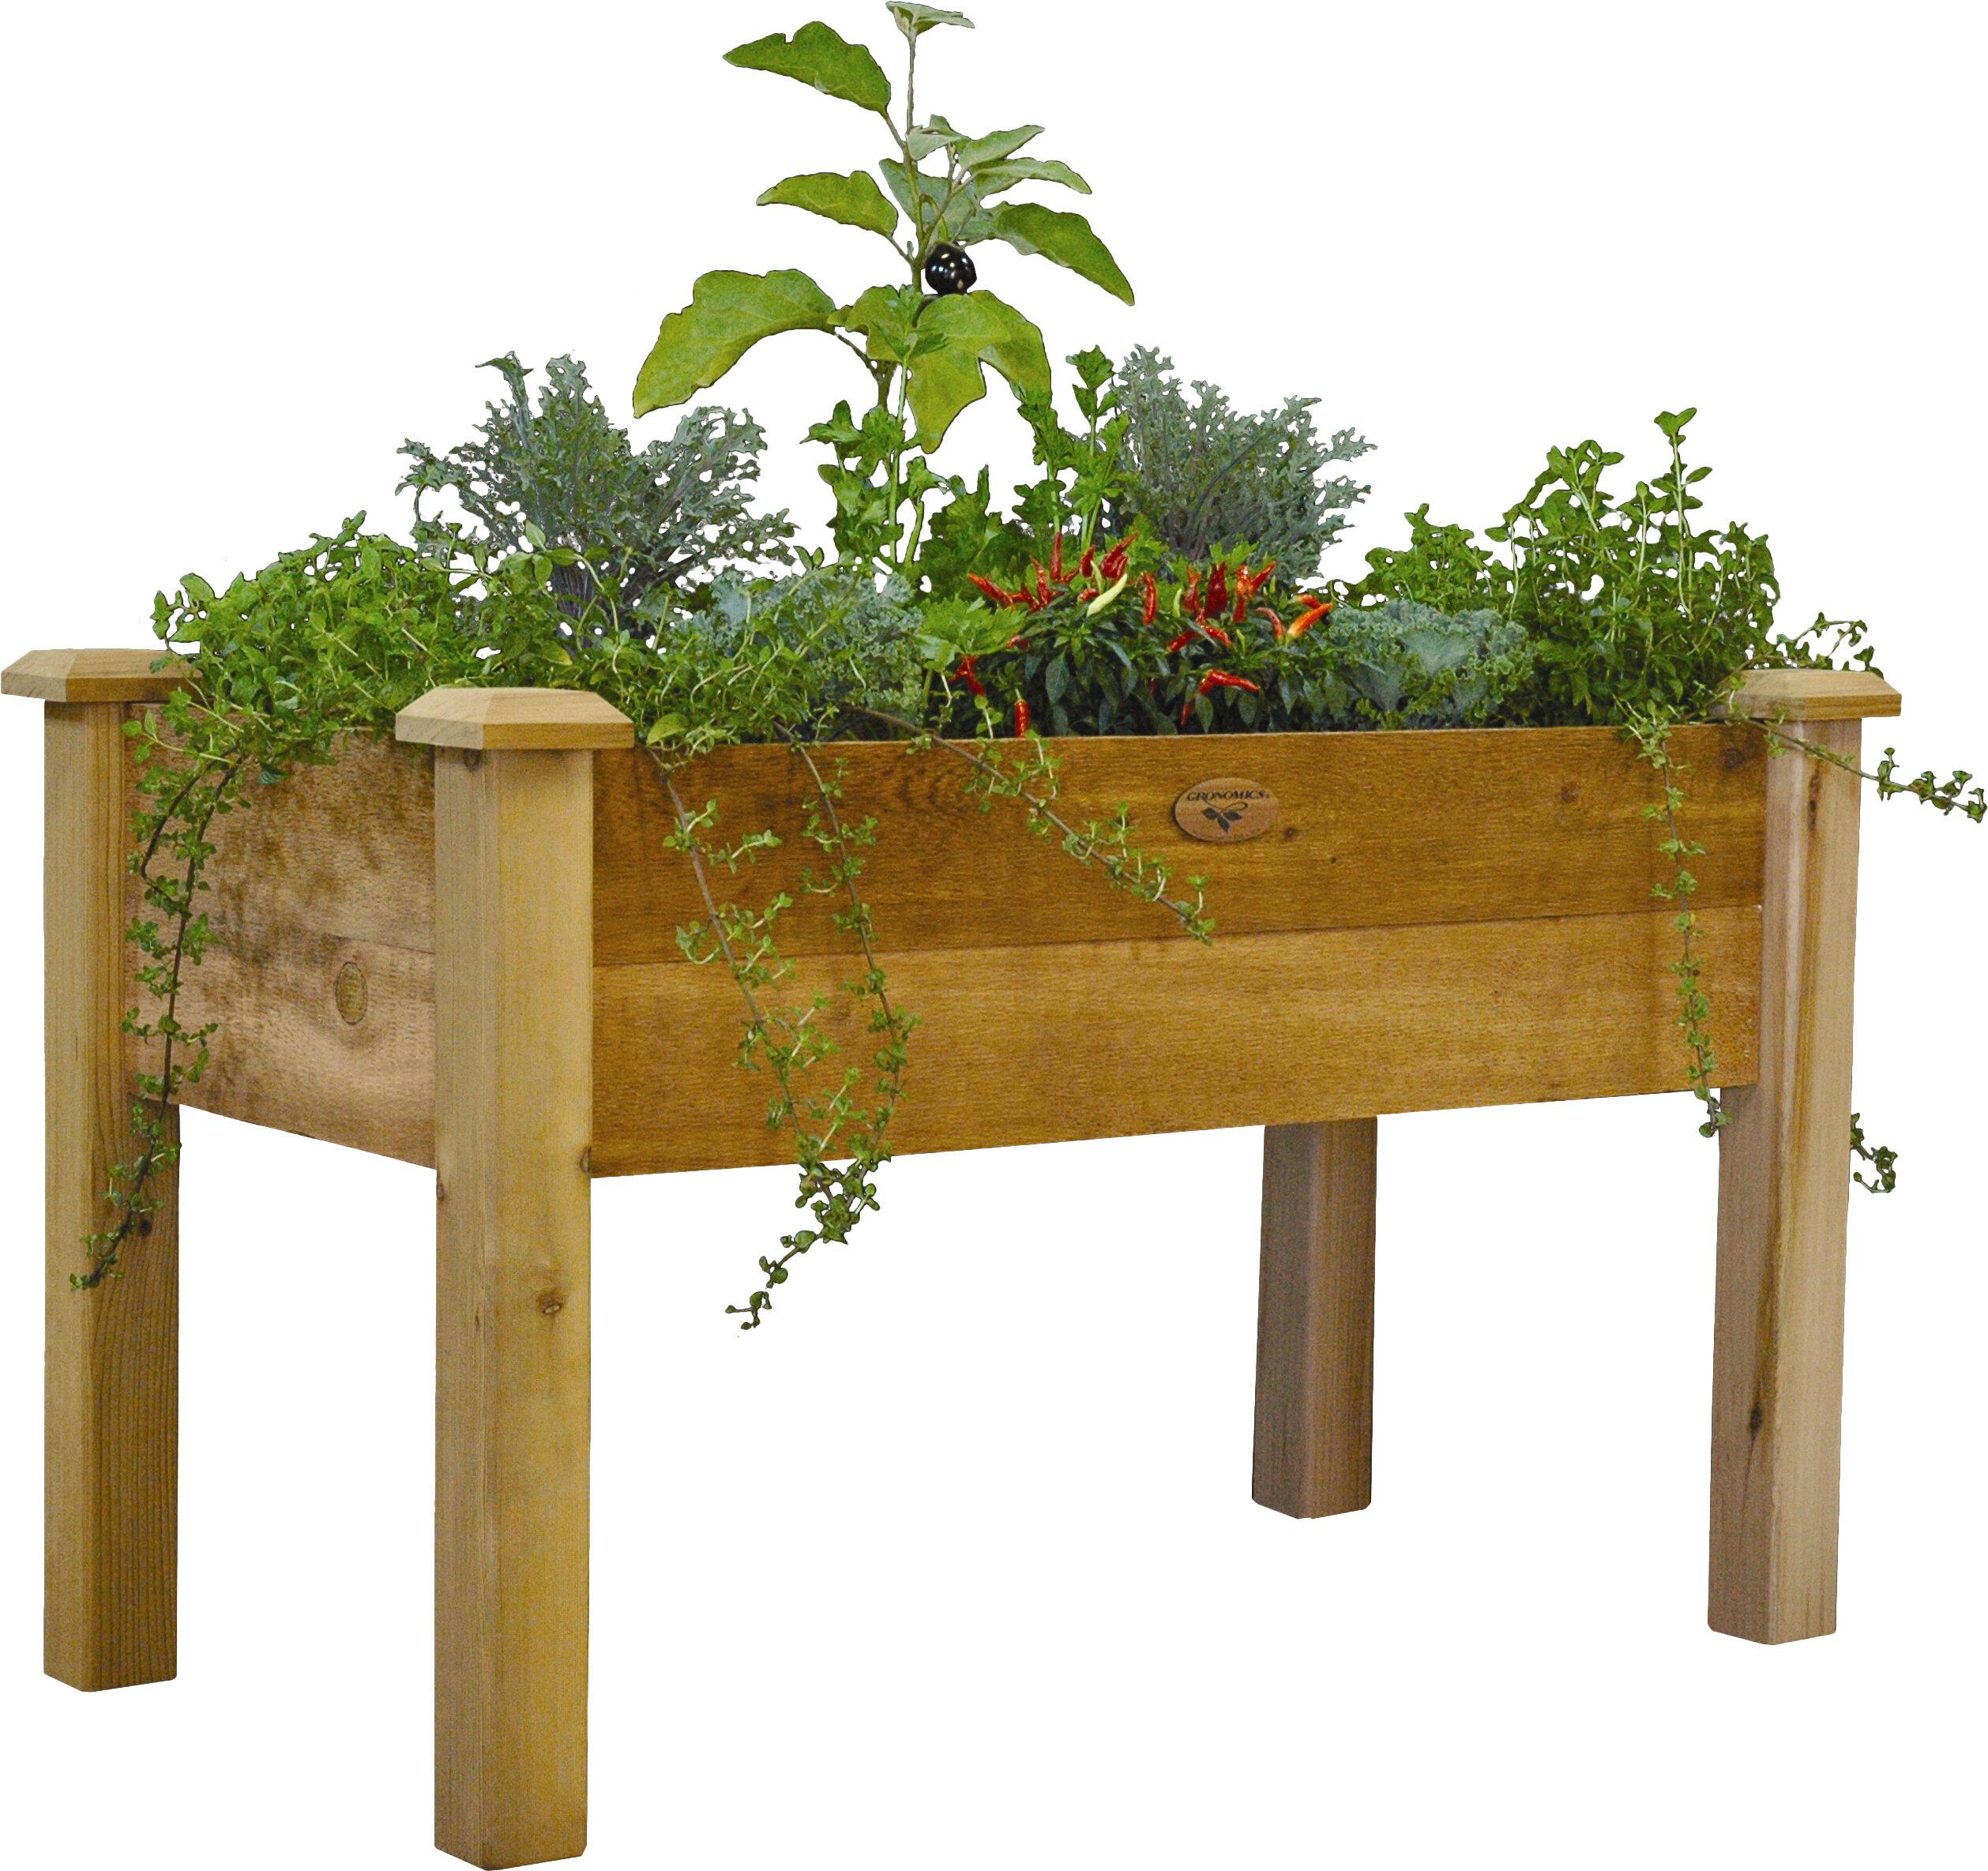 vegetable slope bed building tiered cedar gronomics trellis on garden with raised suncast kit